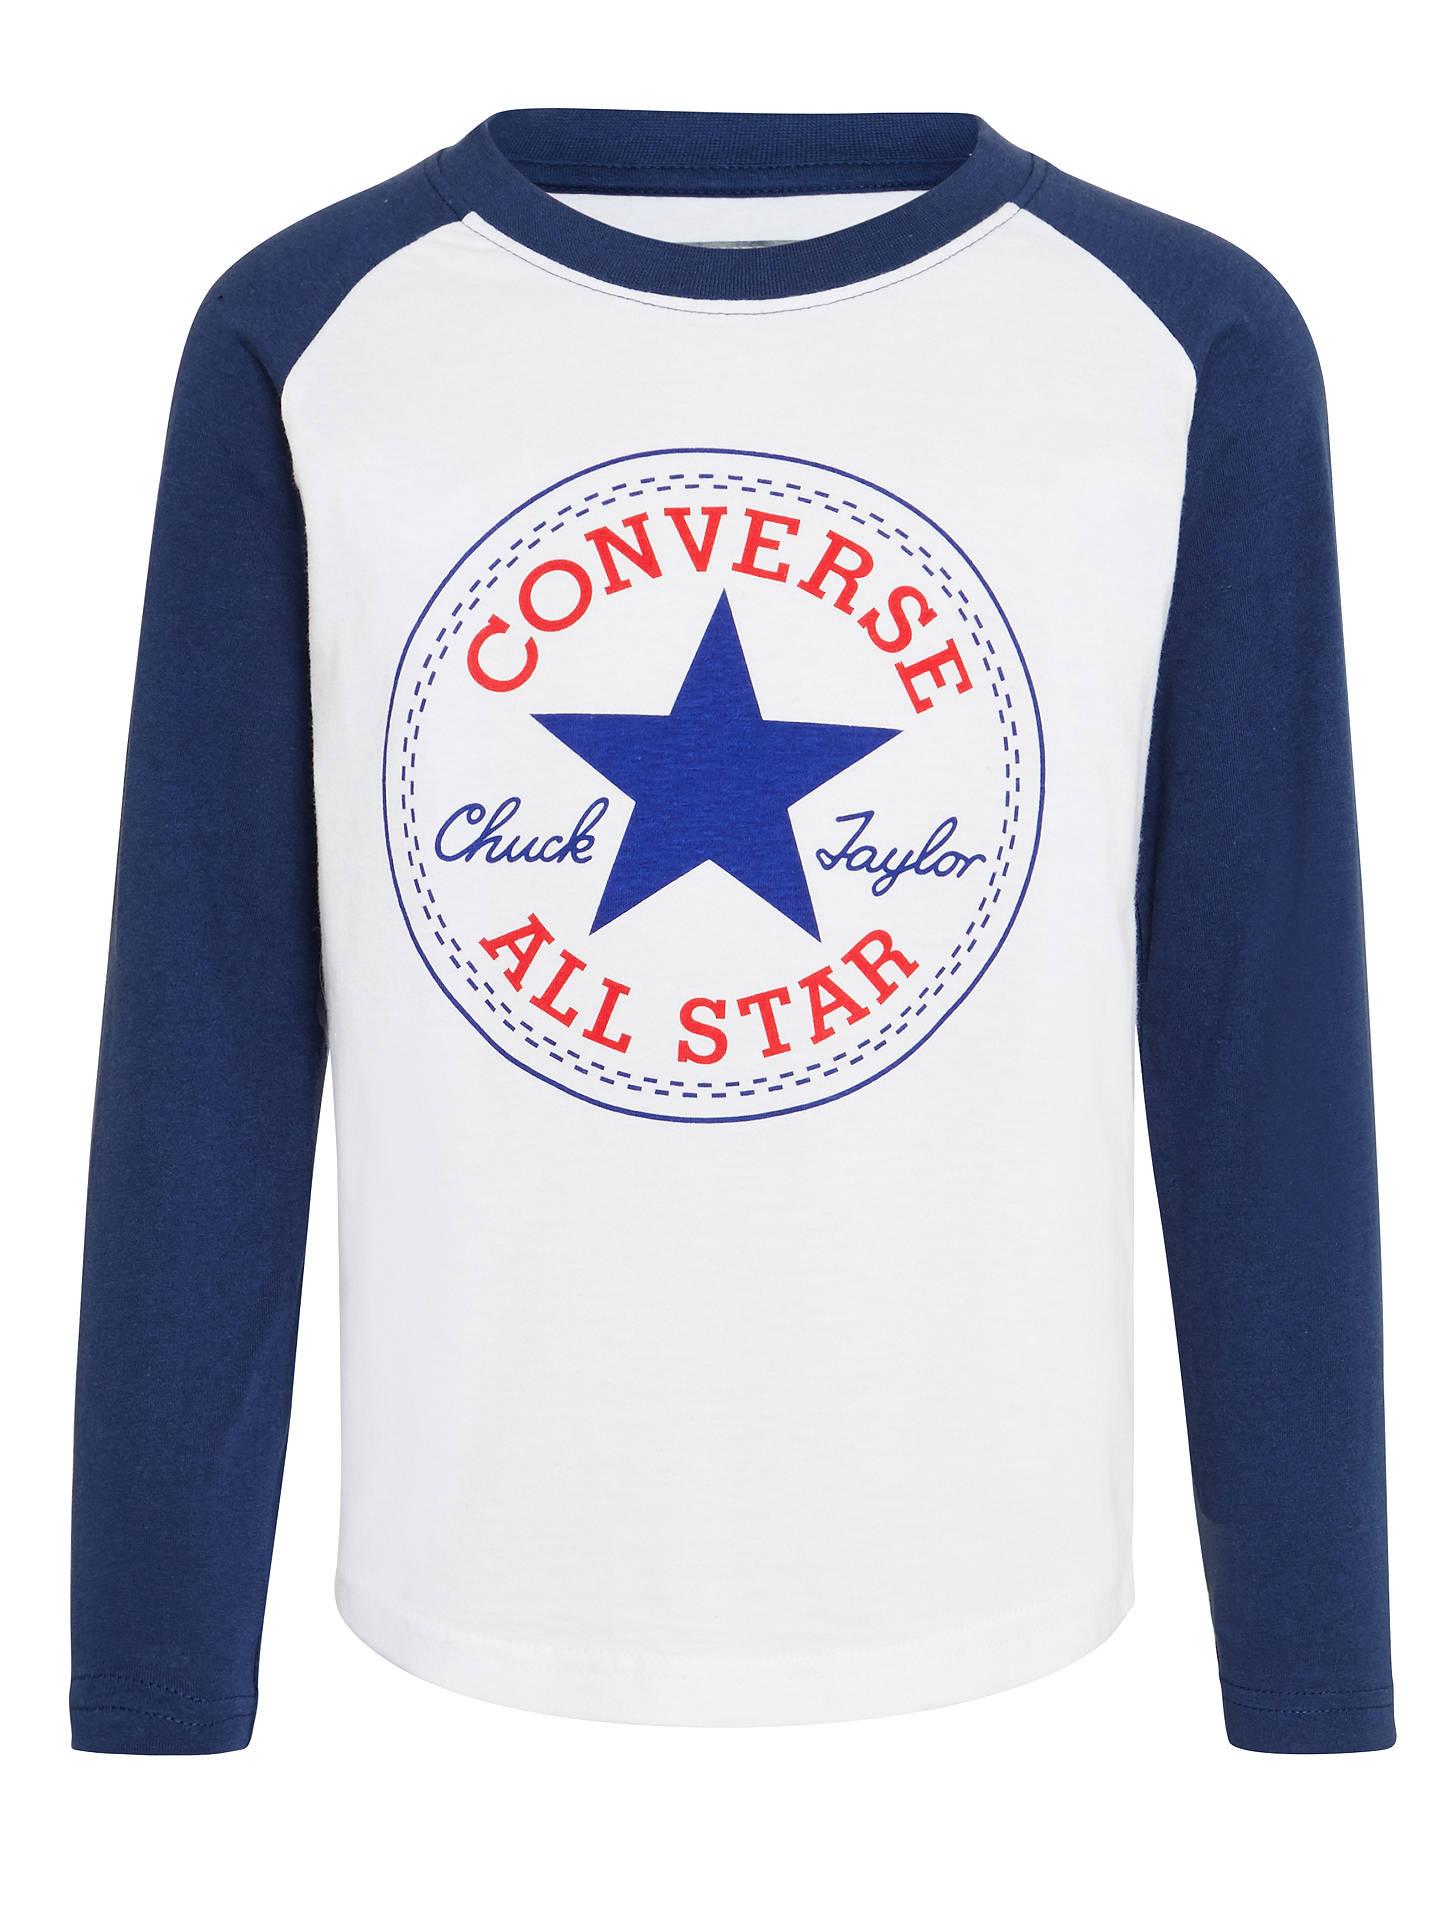 66261d109fd9 Buy Converse Boys  Chuck Patch Raglan